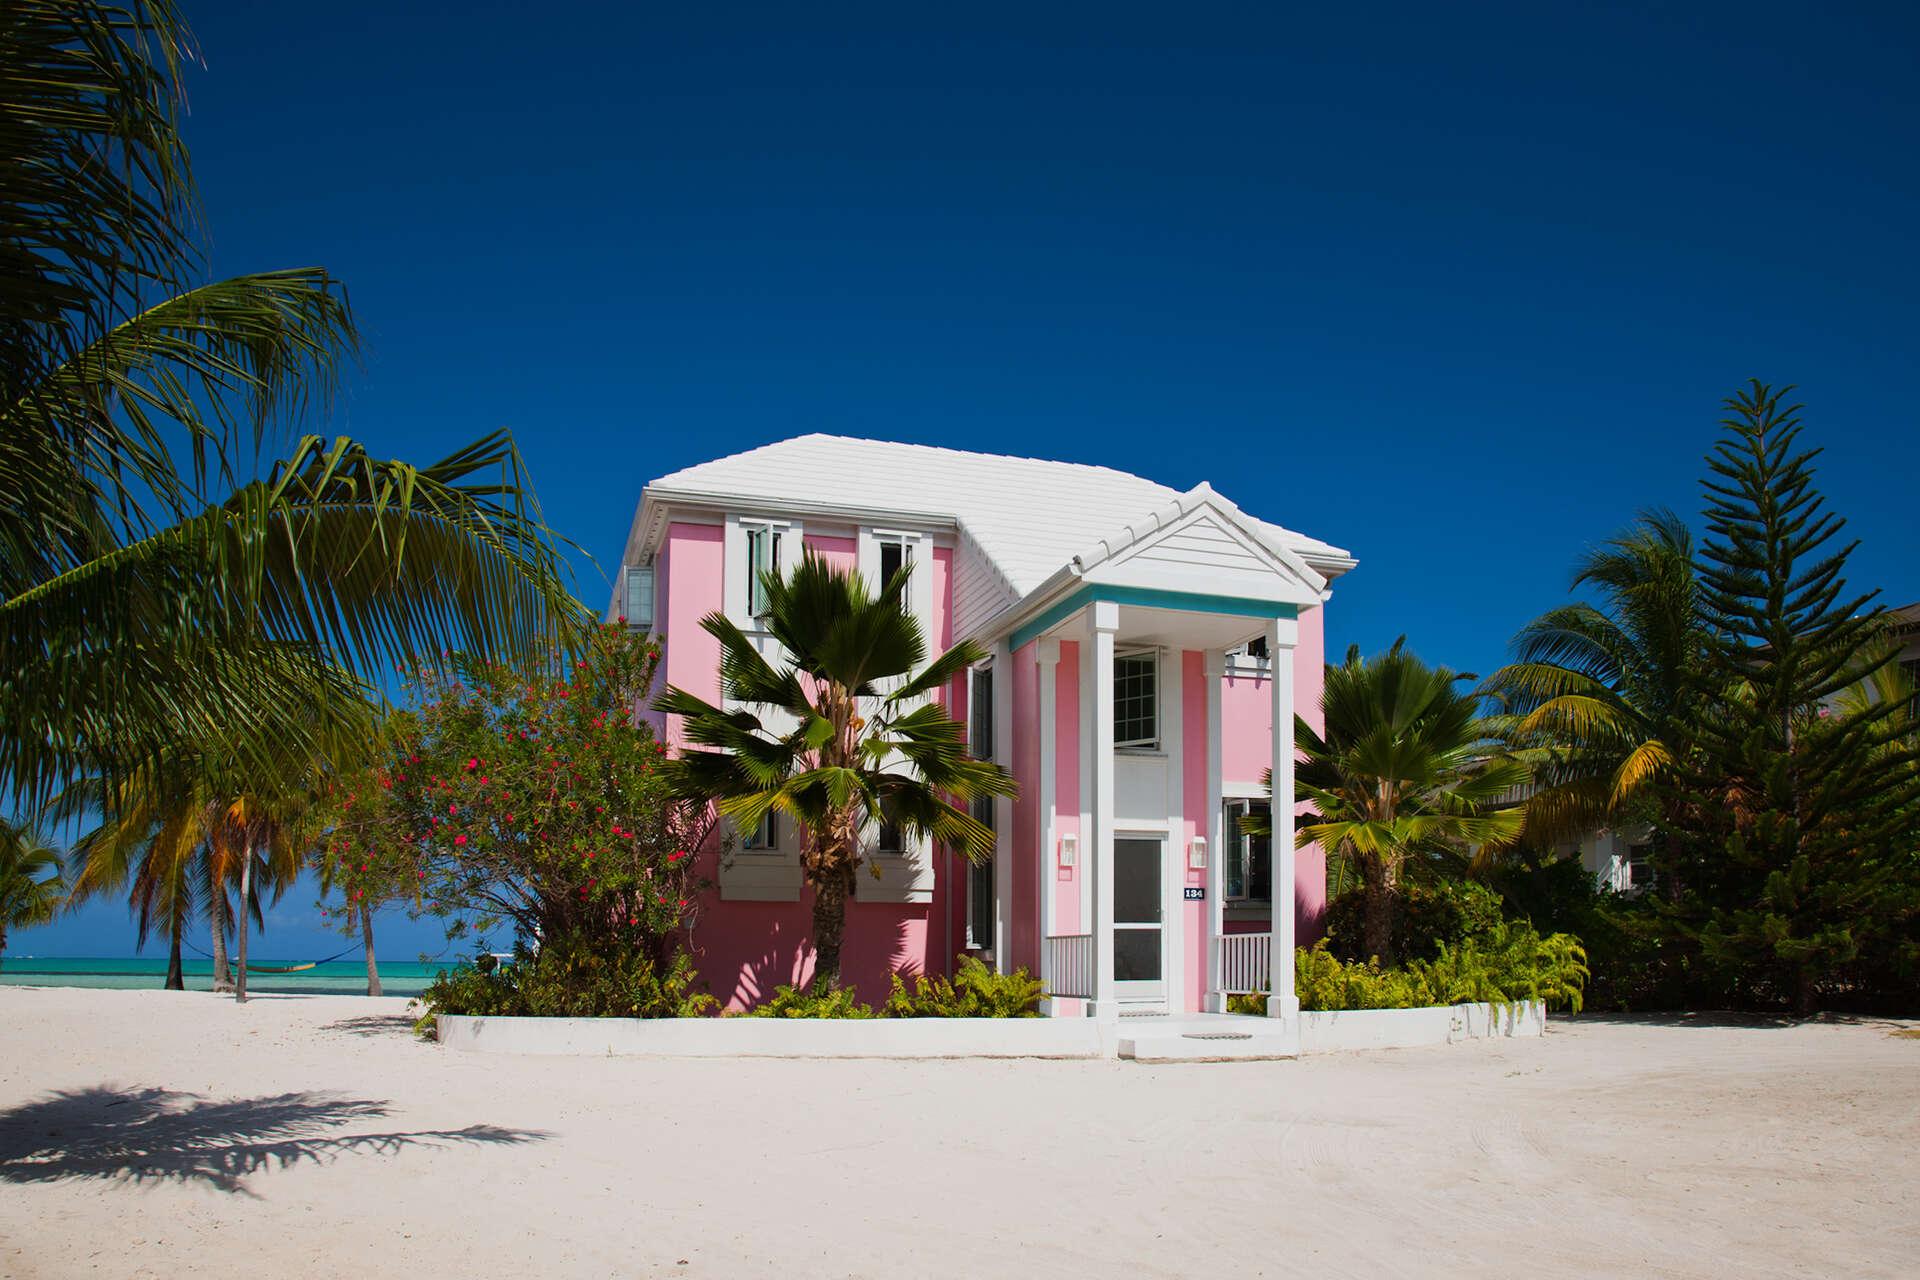 Luxury villa rentals caribbean - Cayman islands - Grand cayman - Cayman kai - We'll Sea - Image 1/14